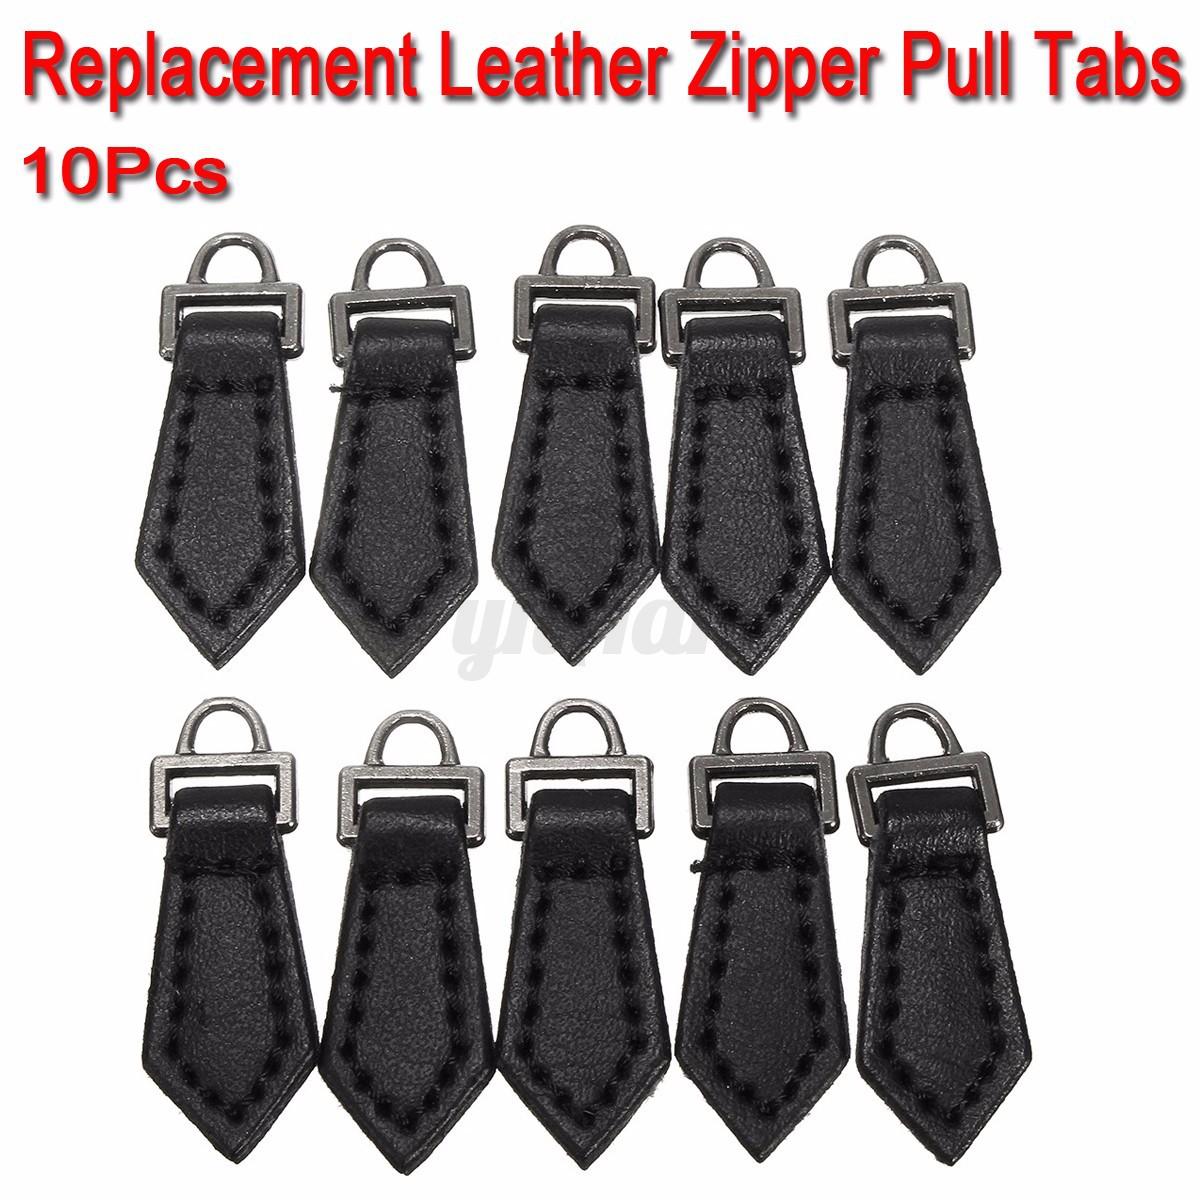 Leather jacket zipper pulls